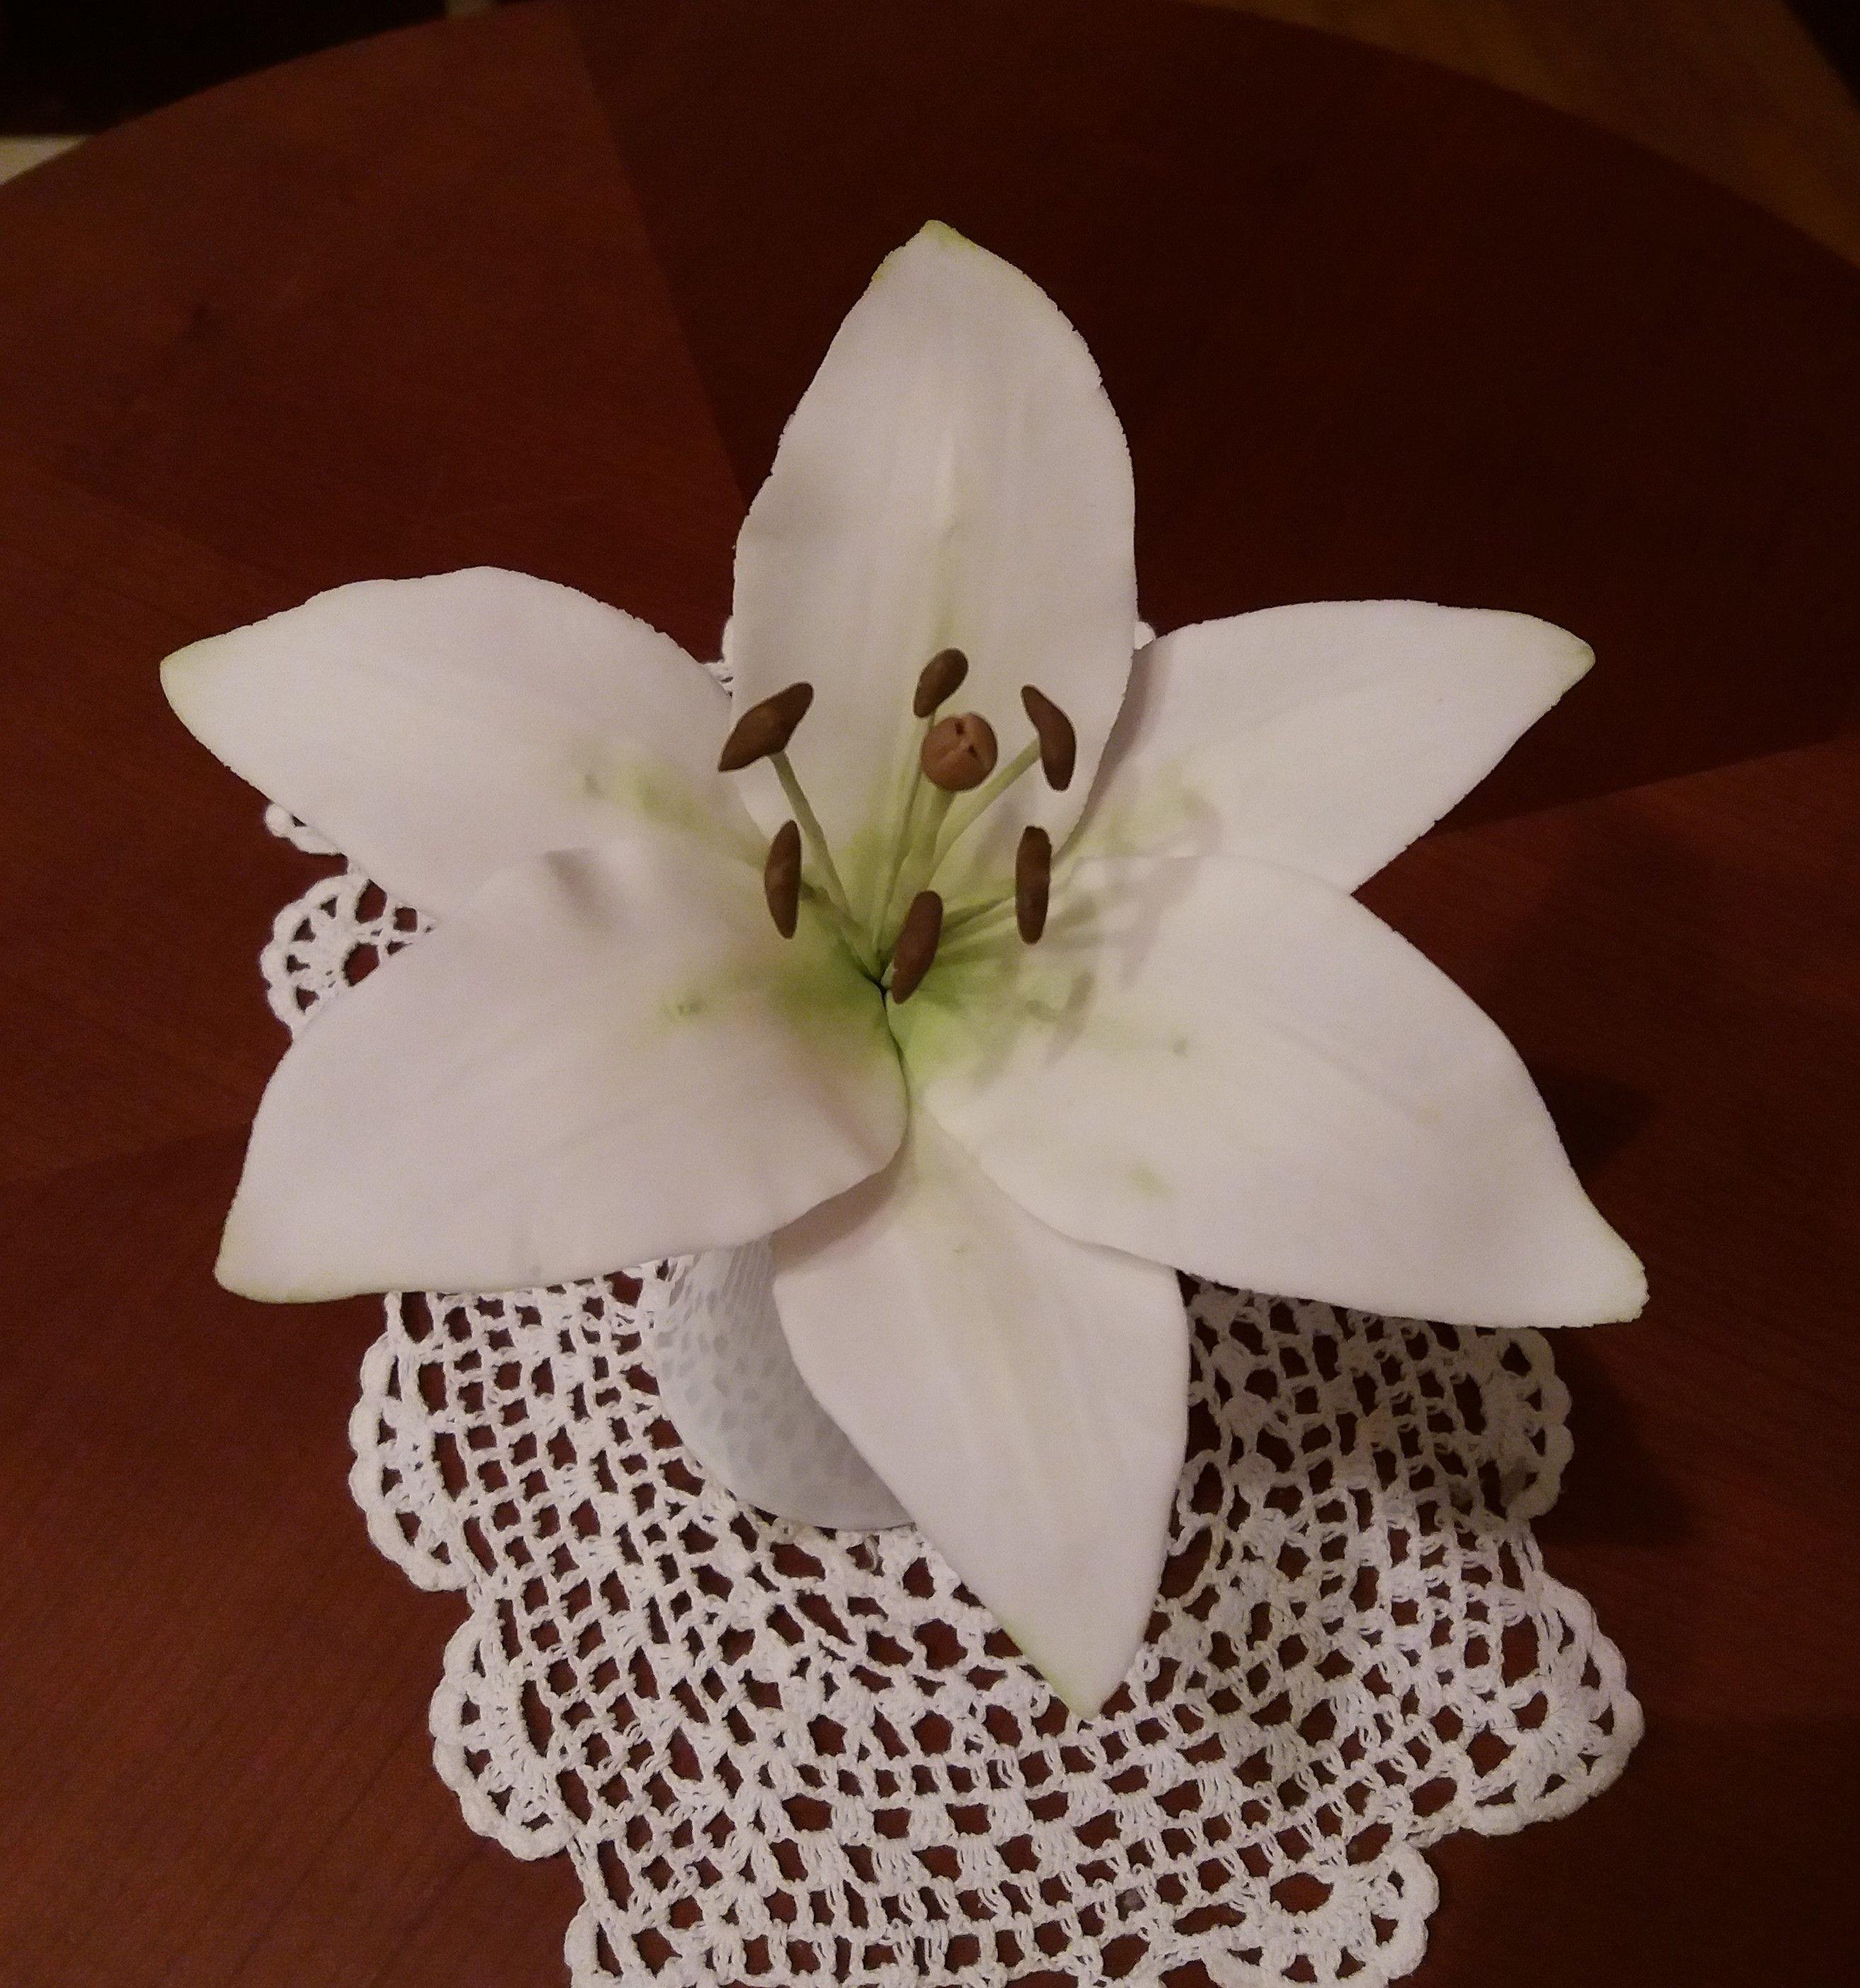 White lily from sugar paste gumpaste ds cakes and sugar flowers white lily from sugar paste gumpaste izmirmasajfo